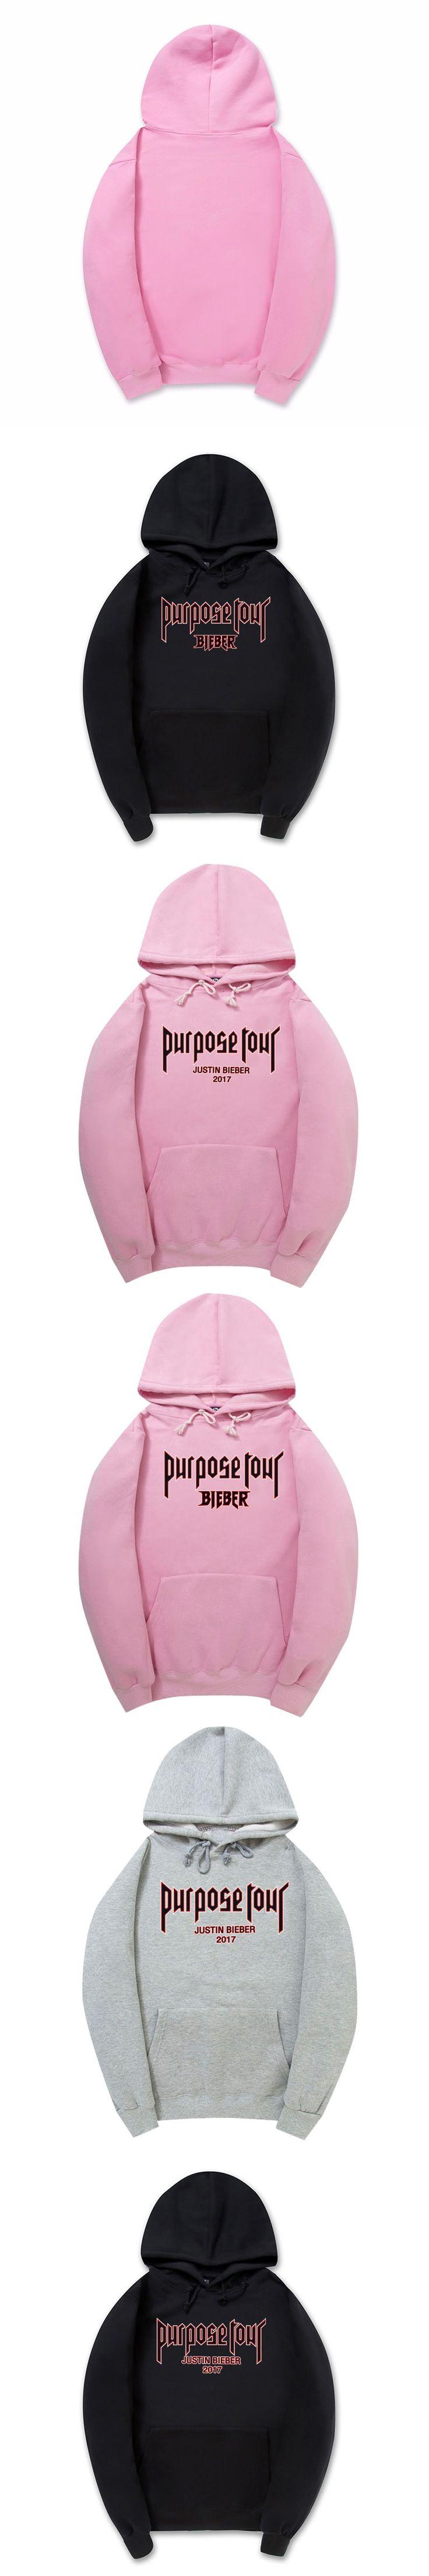 100% cotton Purpose Tour Justin Bieber 2017 hoodies HipHop Streetwear black pink pullover jumper Men/Women Hoodie Sweatshirt 2XL